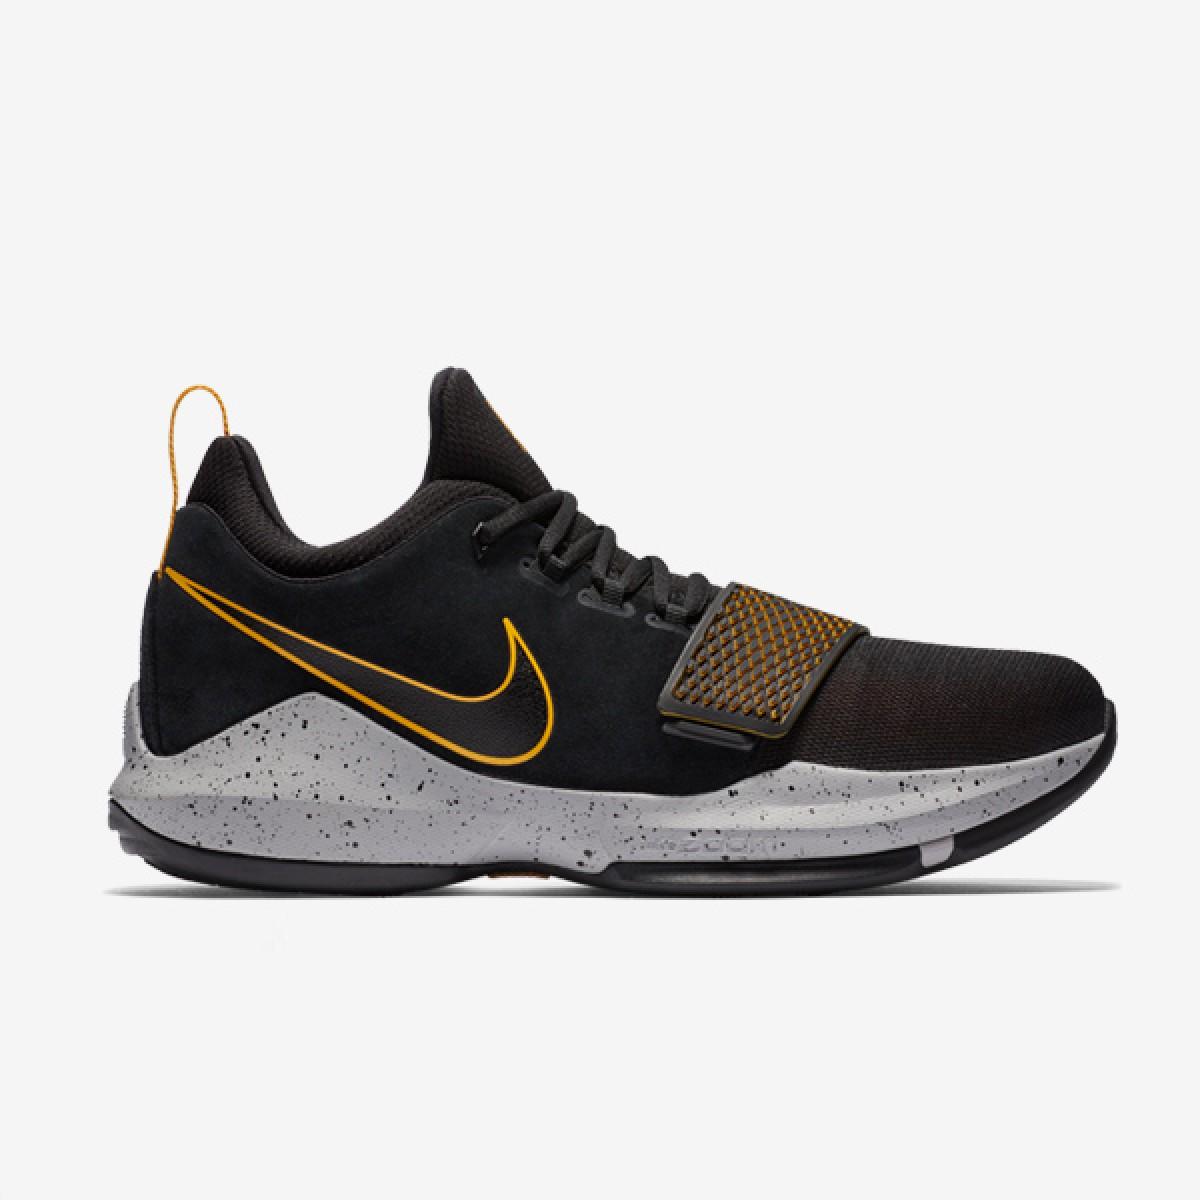 Nike PG 1 'Black Gold'